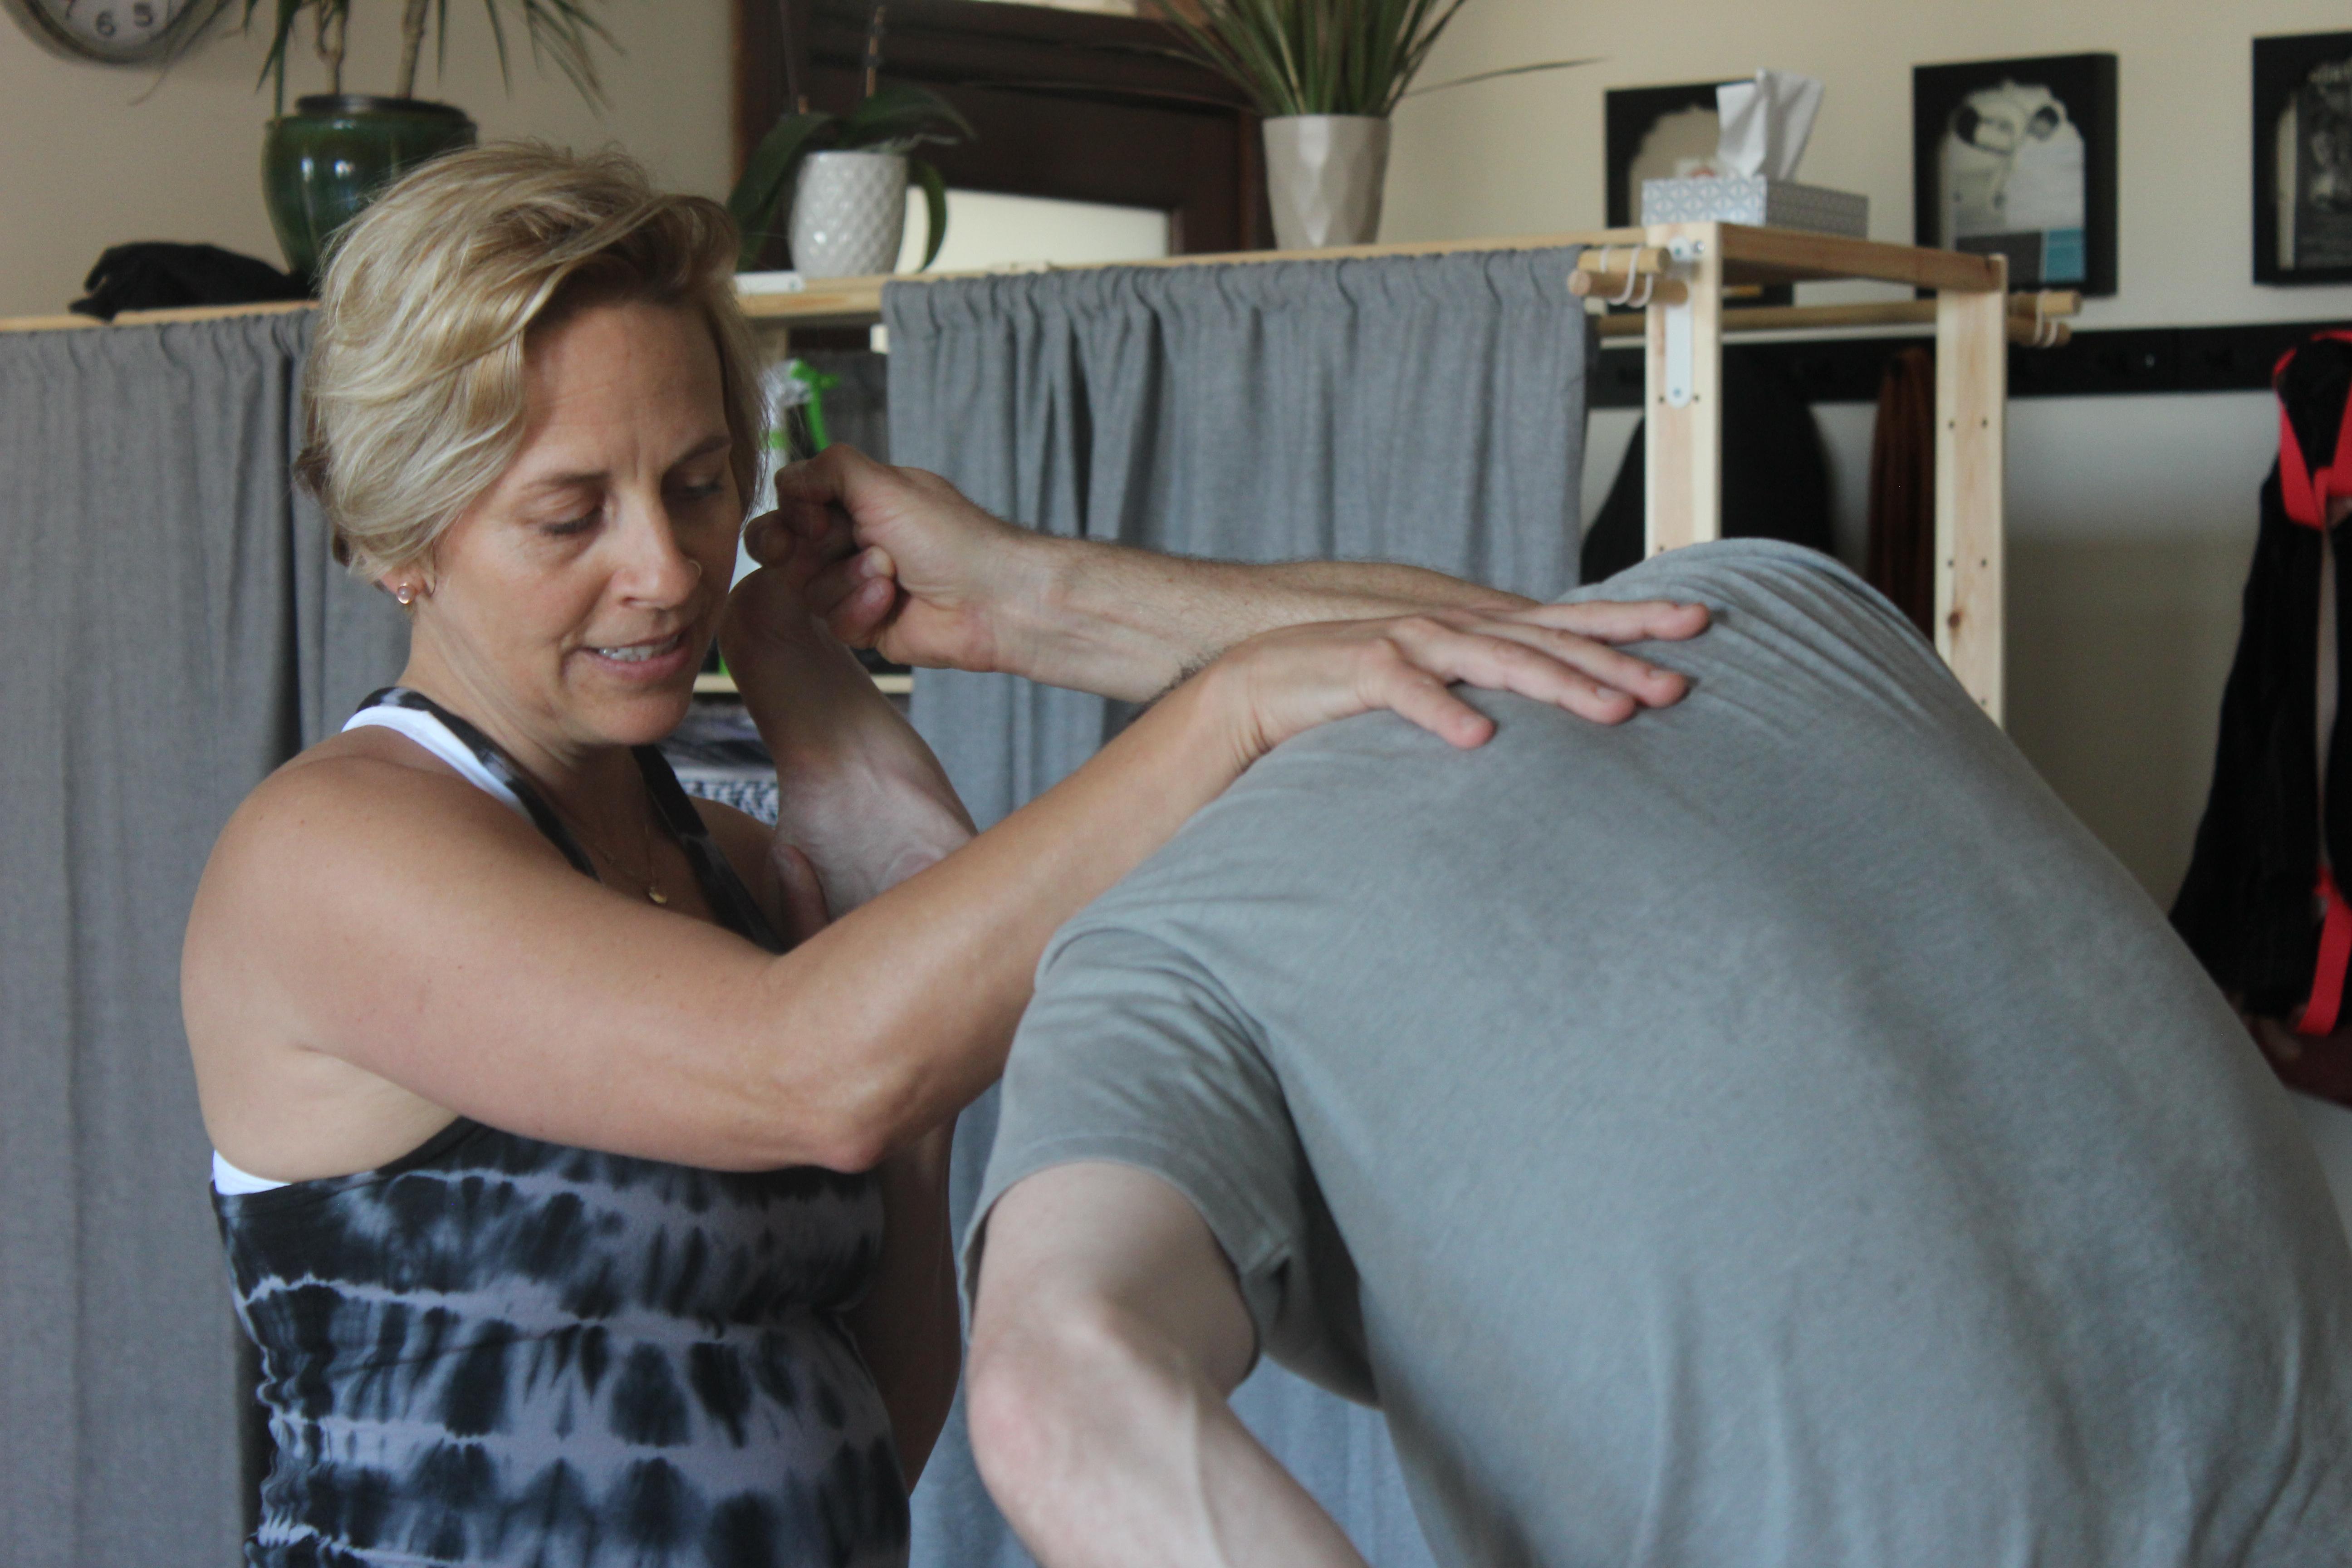 Pain to Gain: Ashtanga Yoga Northampton founder talks path to more enlightened practice